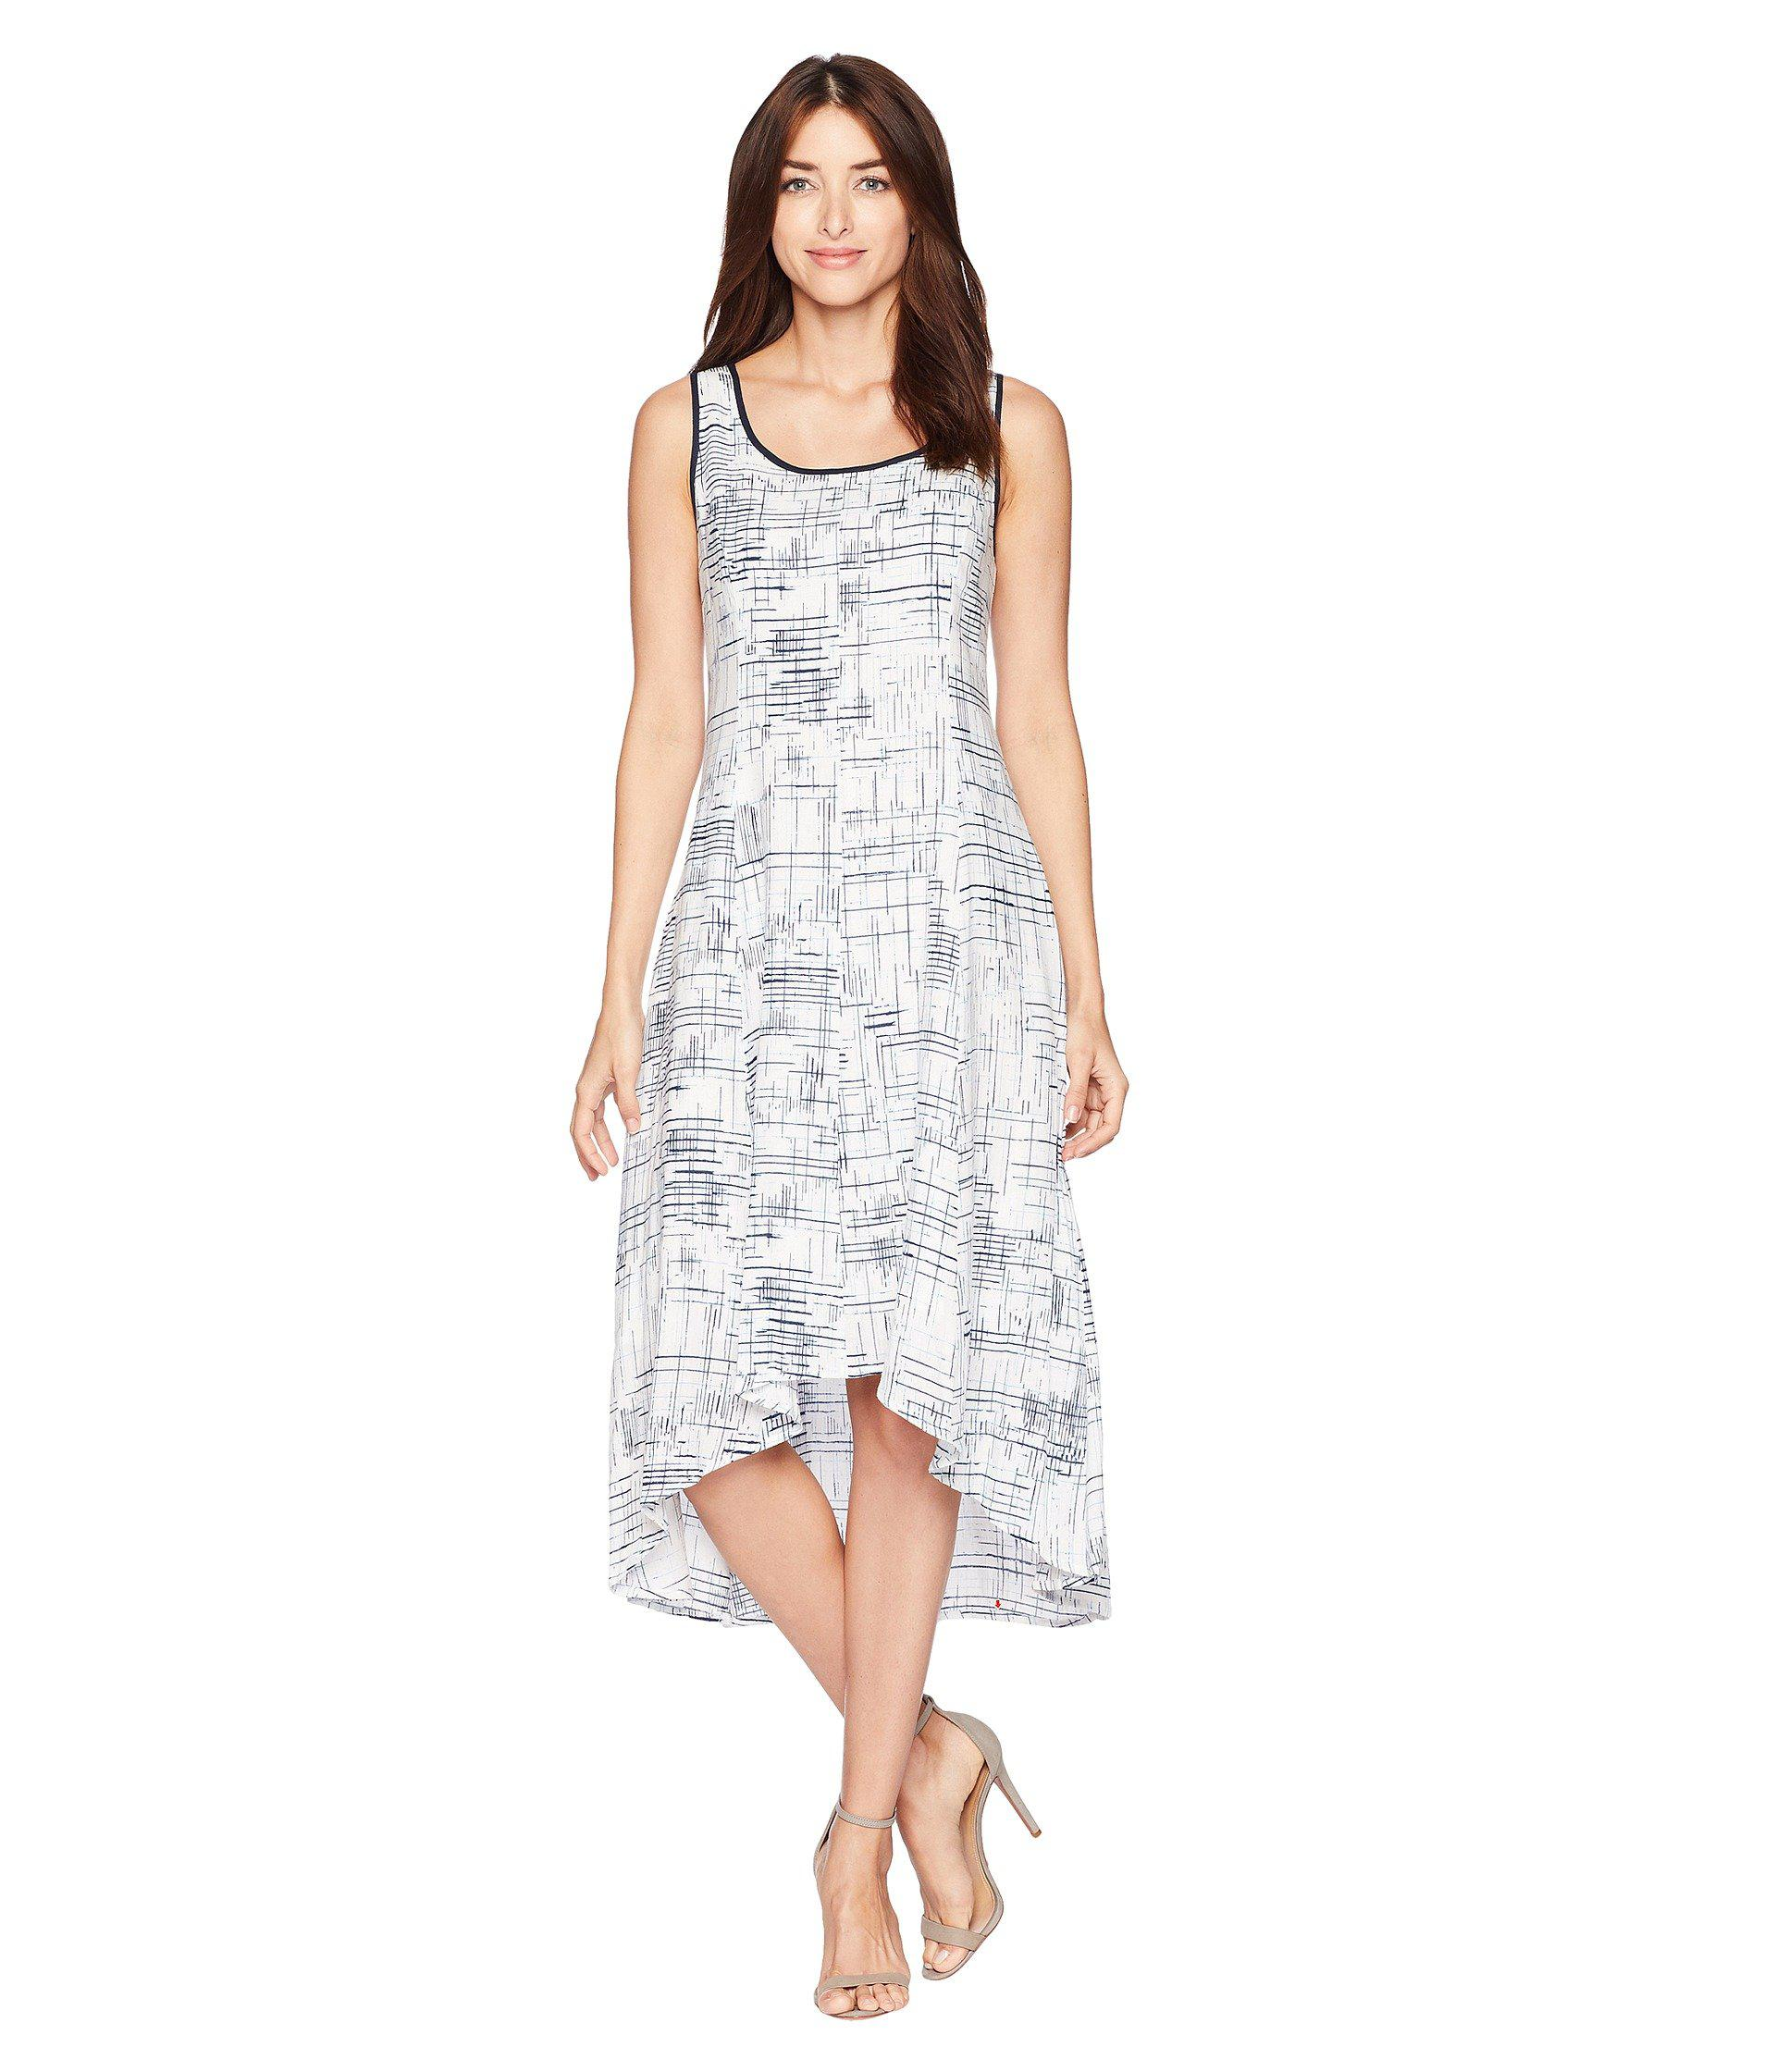 f962f7075df Jones New York. Women s White Sleeveless Printed Linen High-low Hem Dress